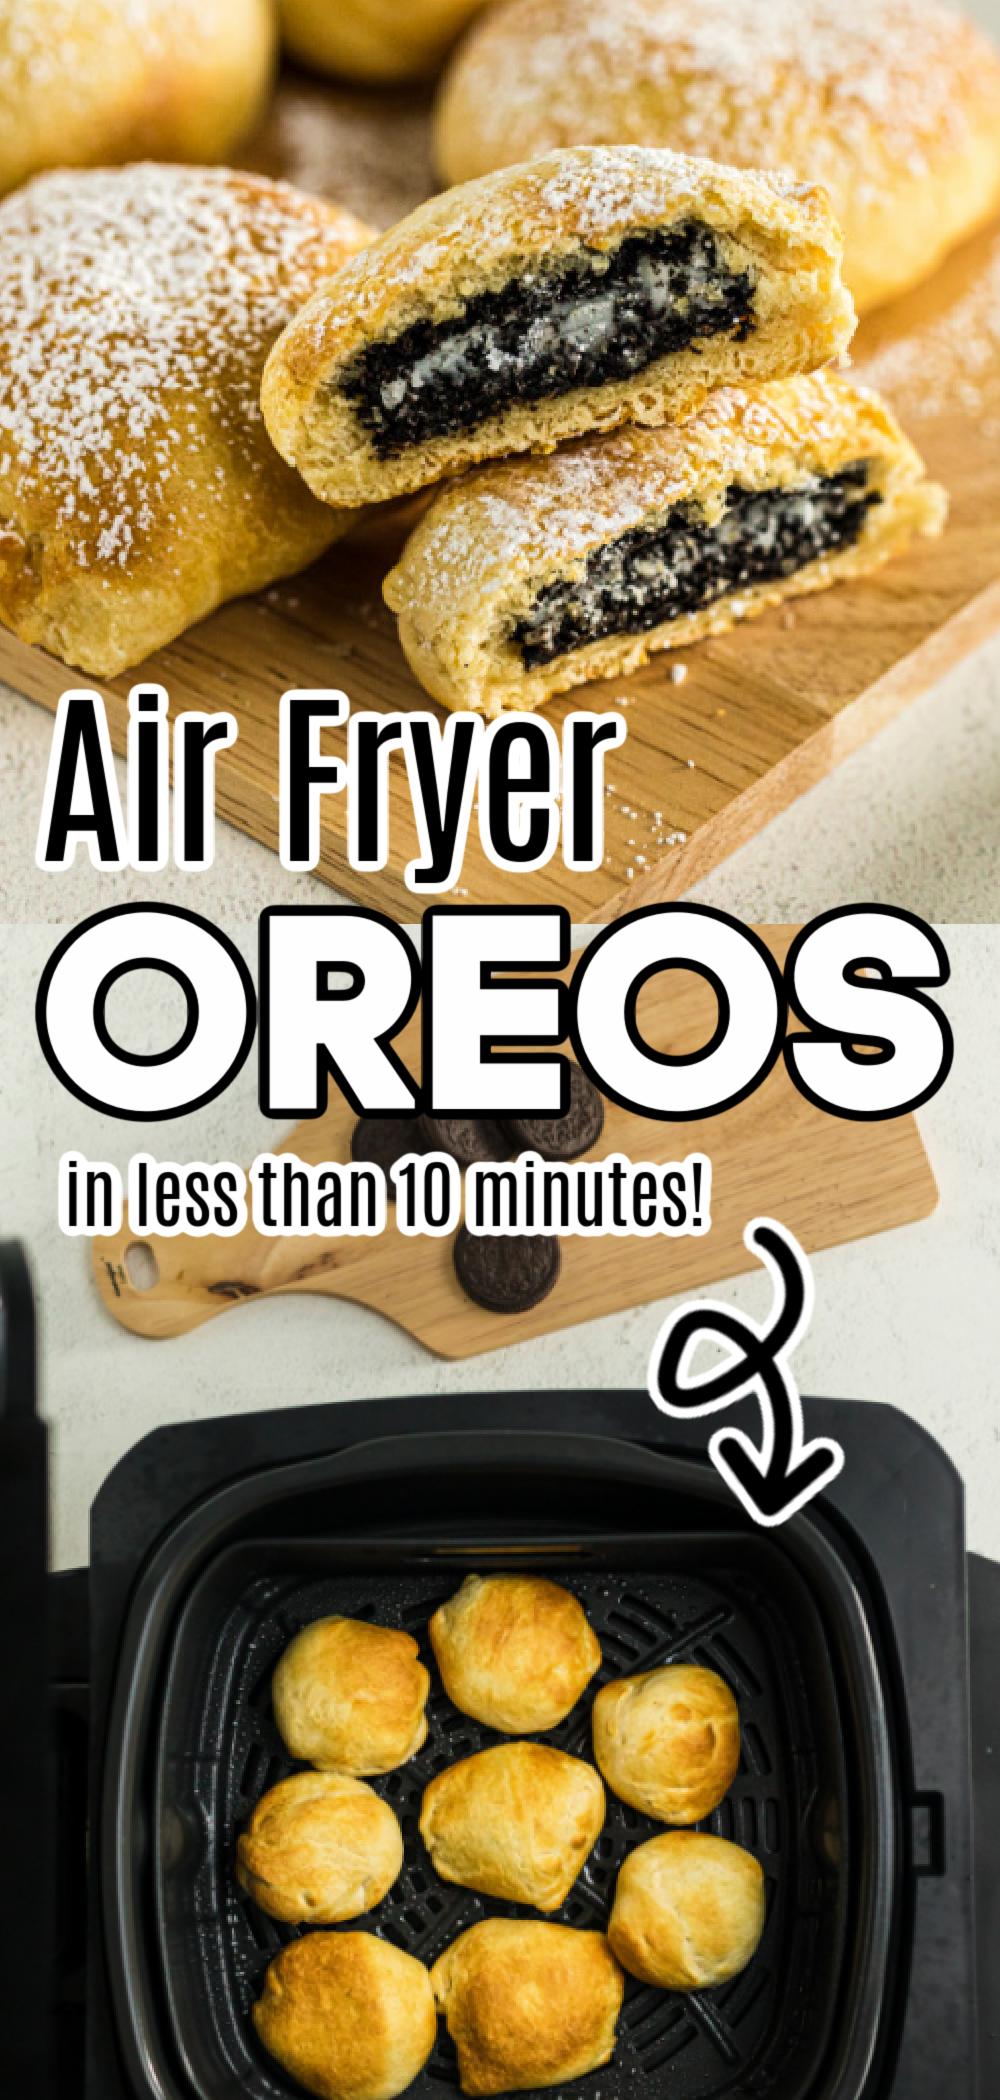 Air Fryer Oreos Recipe in 2020 Fair food recipes